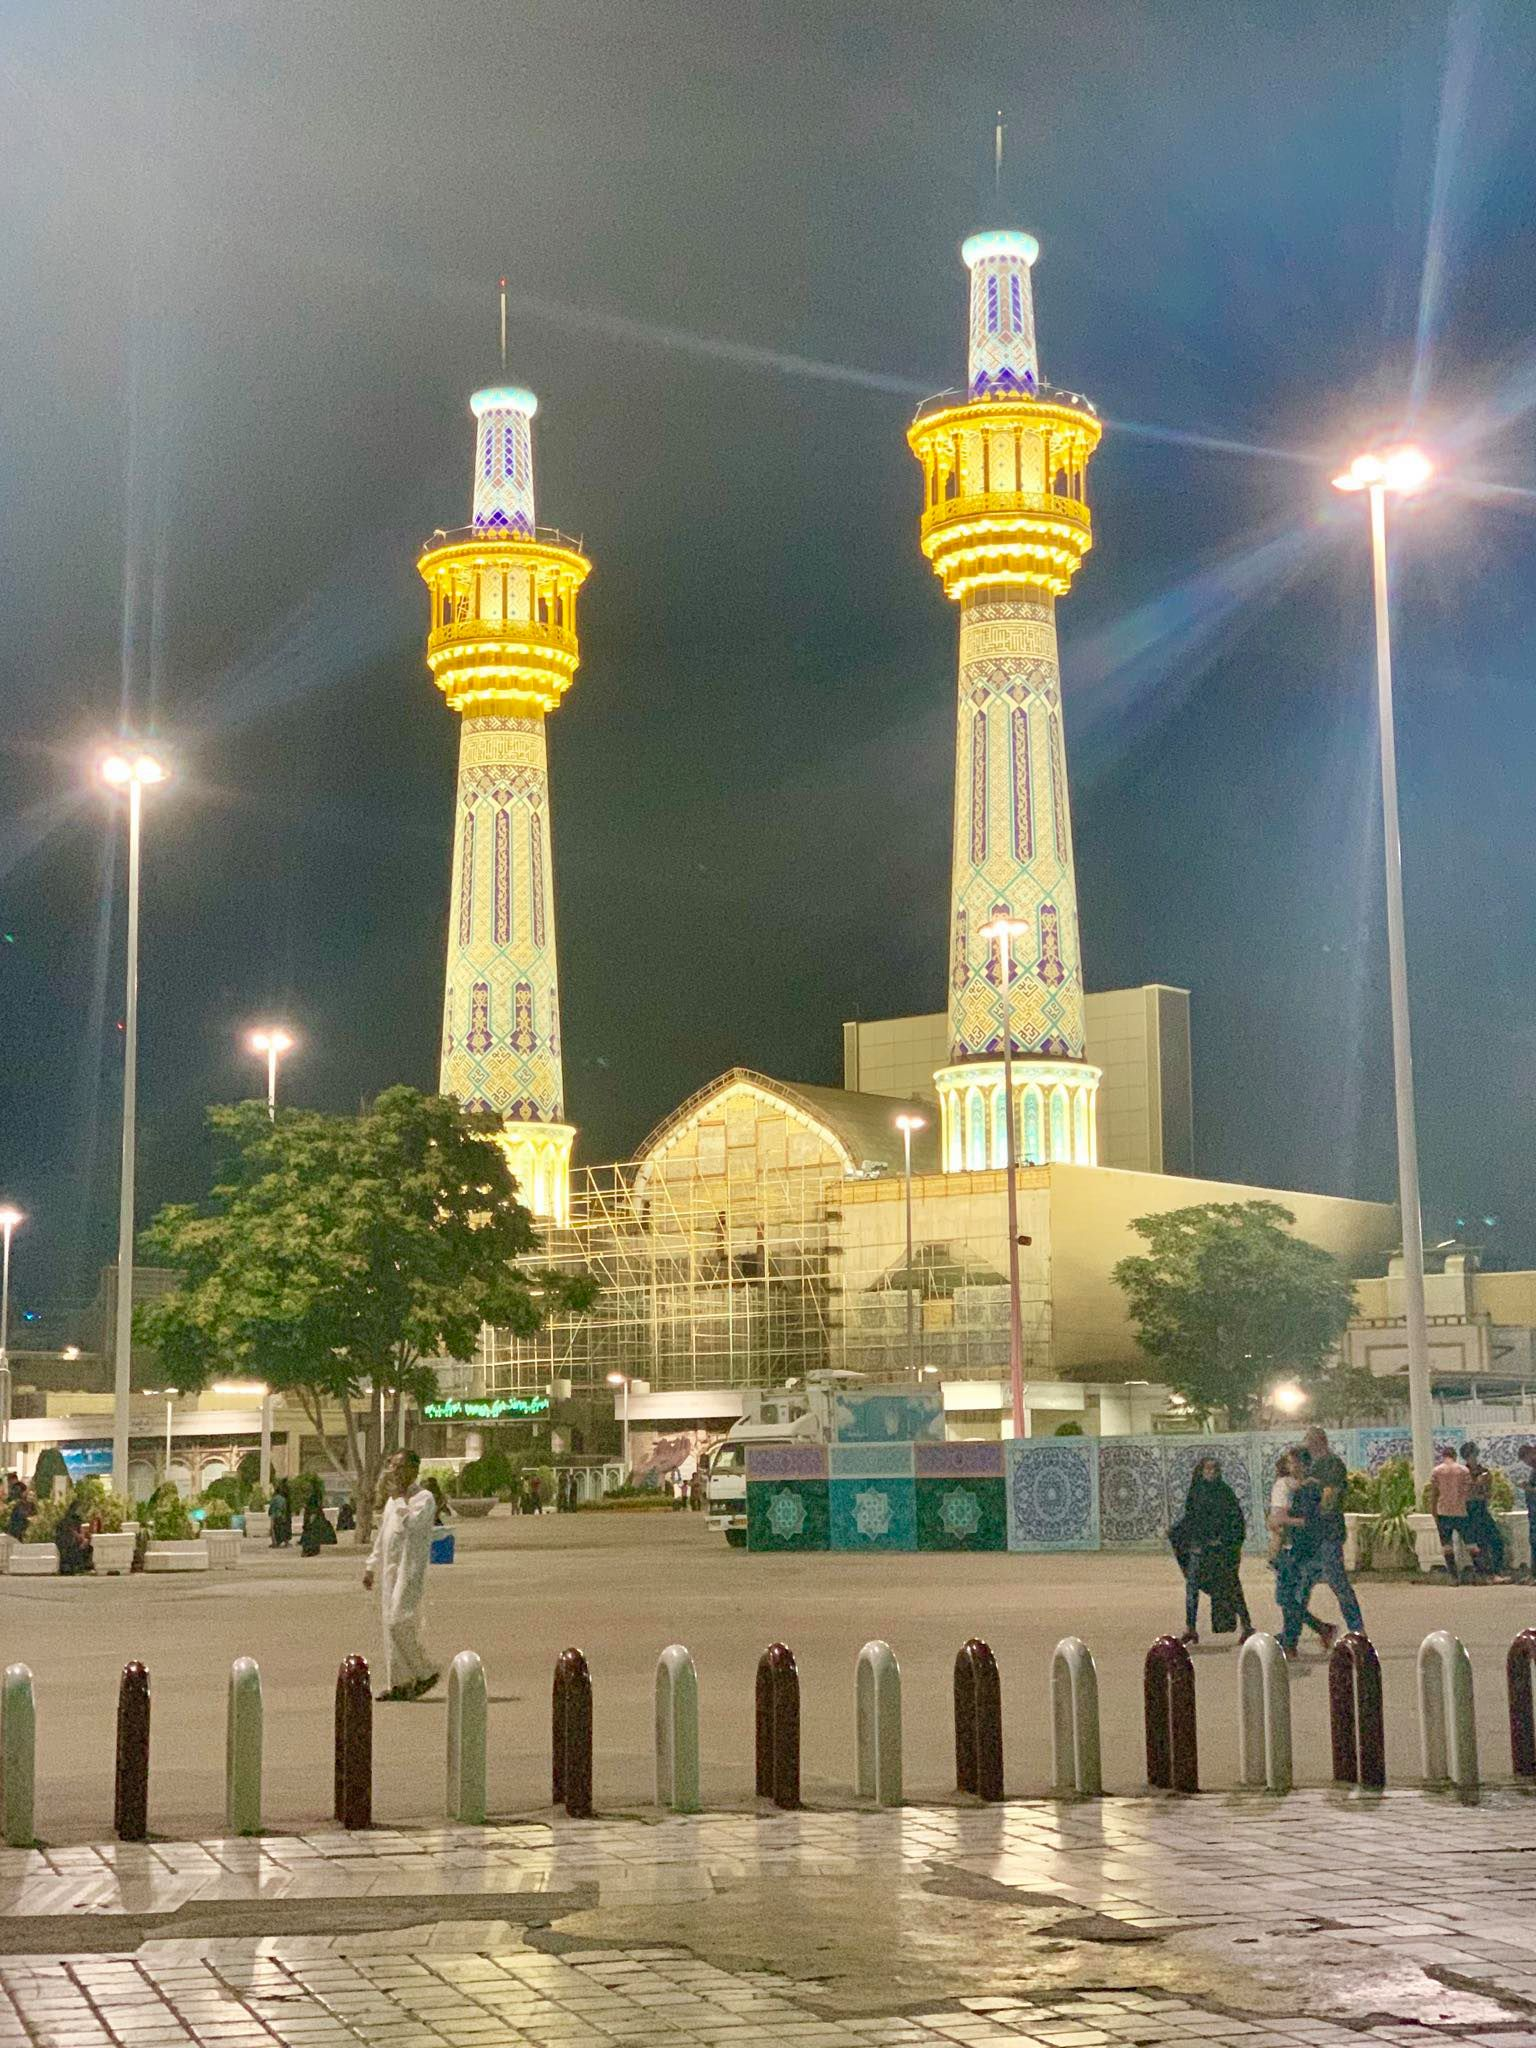 Kach Solo Travels in 2019 Overnight in Mashhad12.jpg